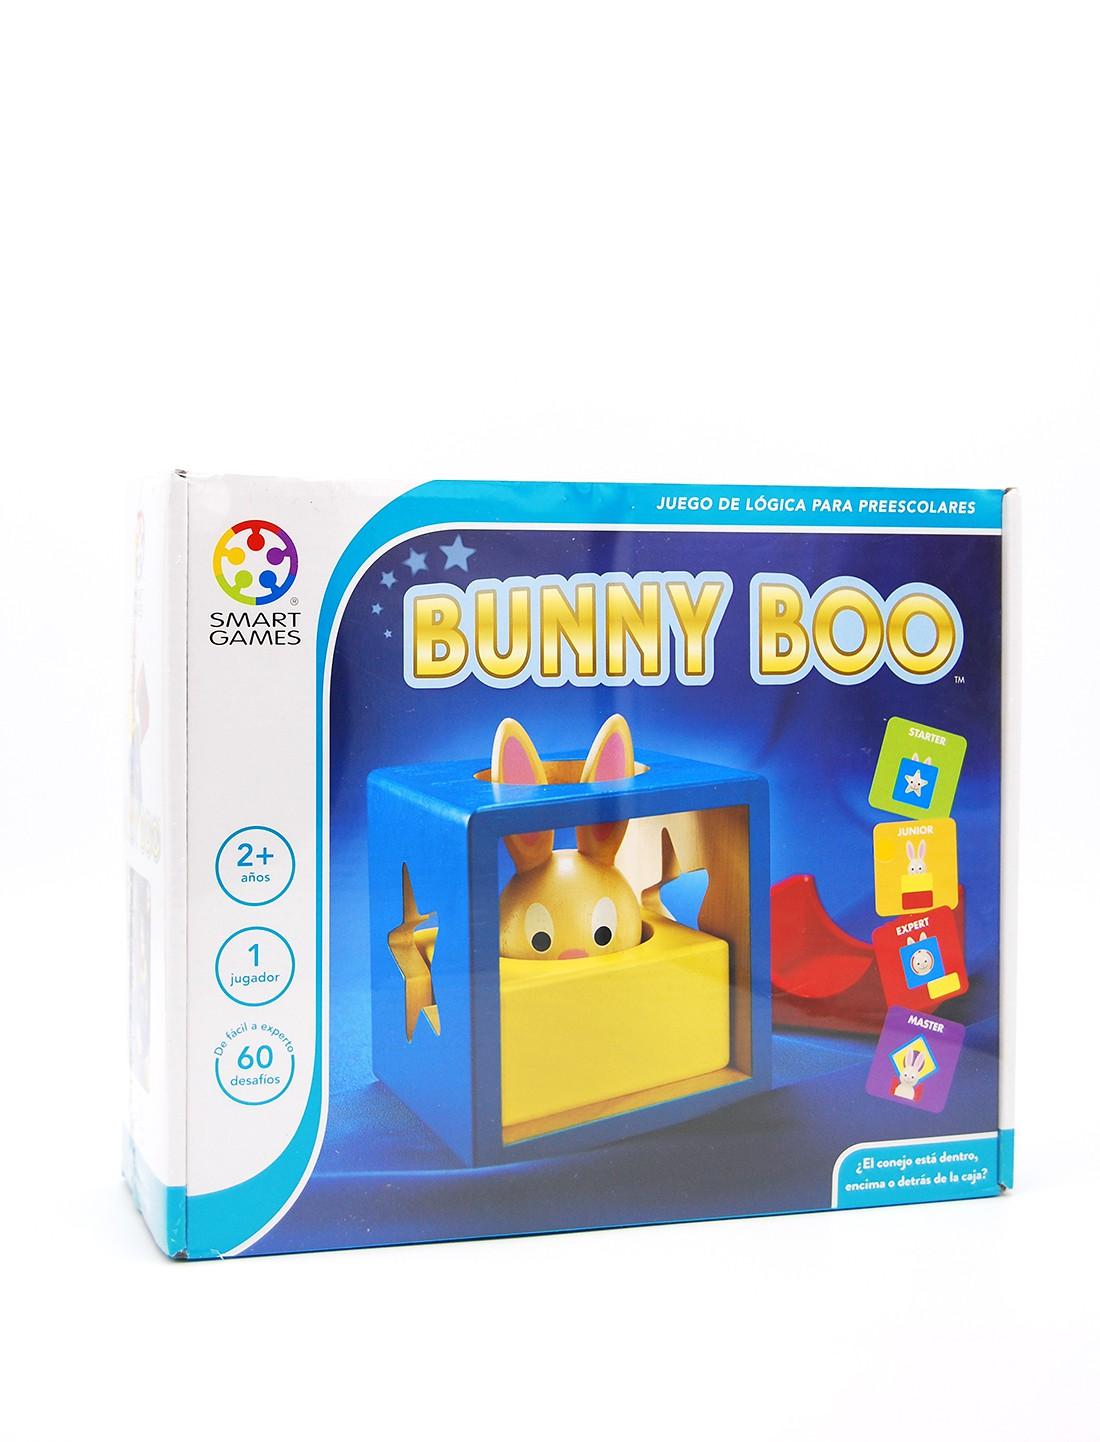 Bunny Boo. Smart Games